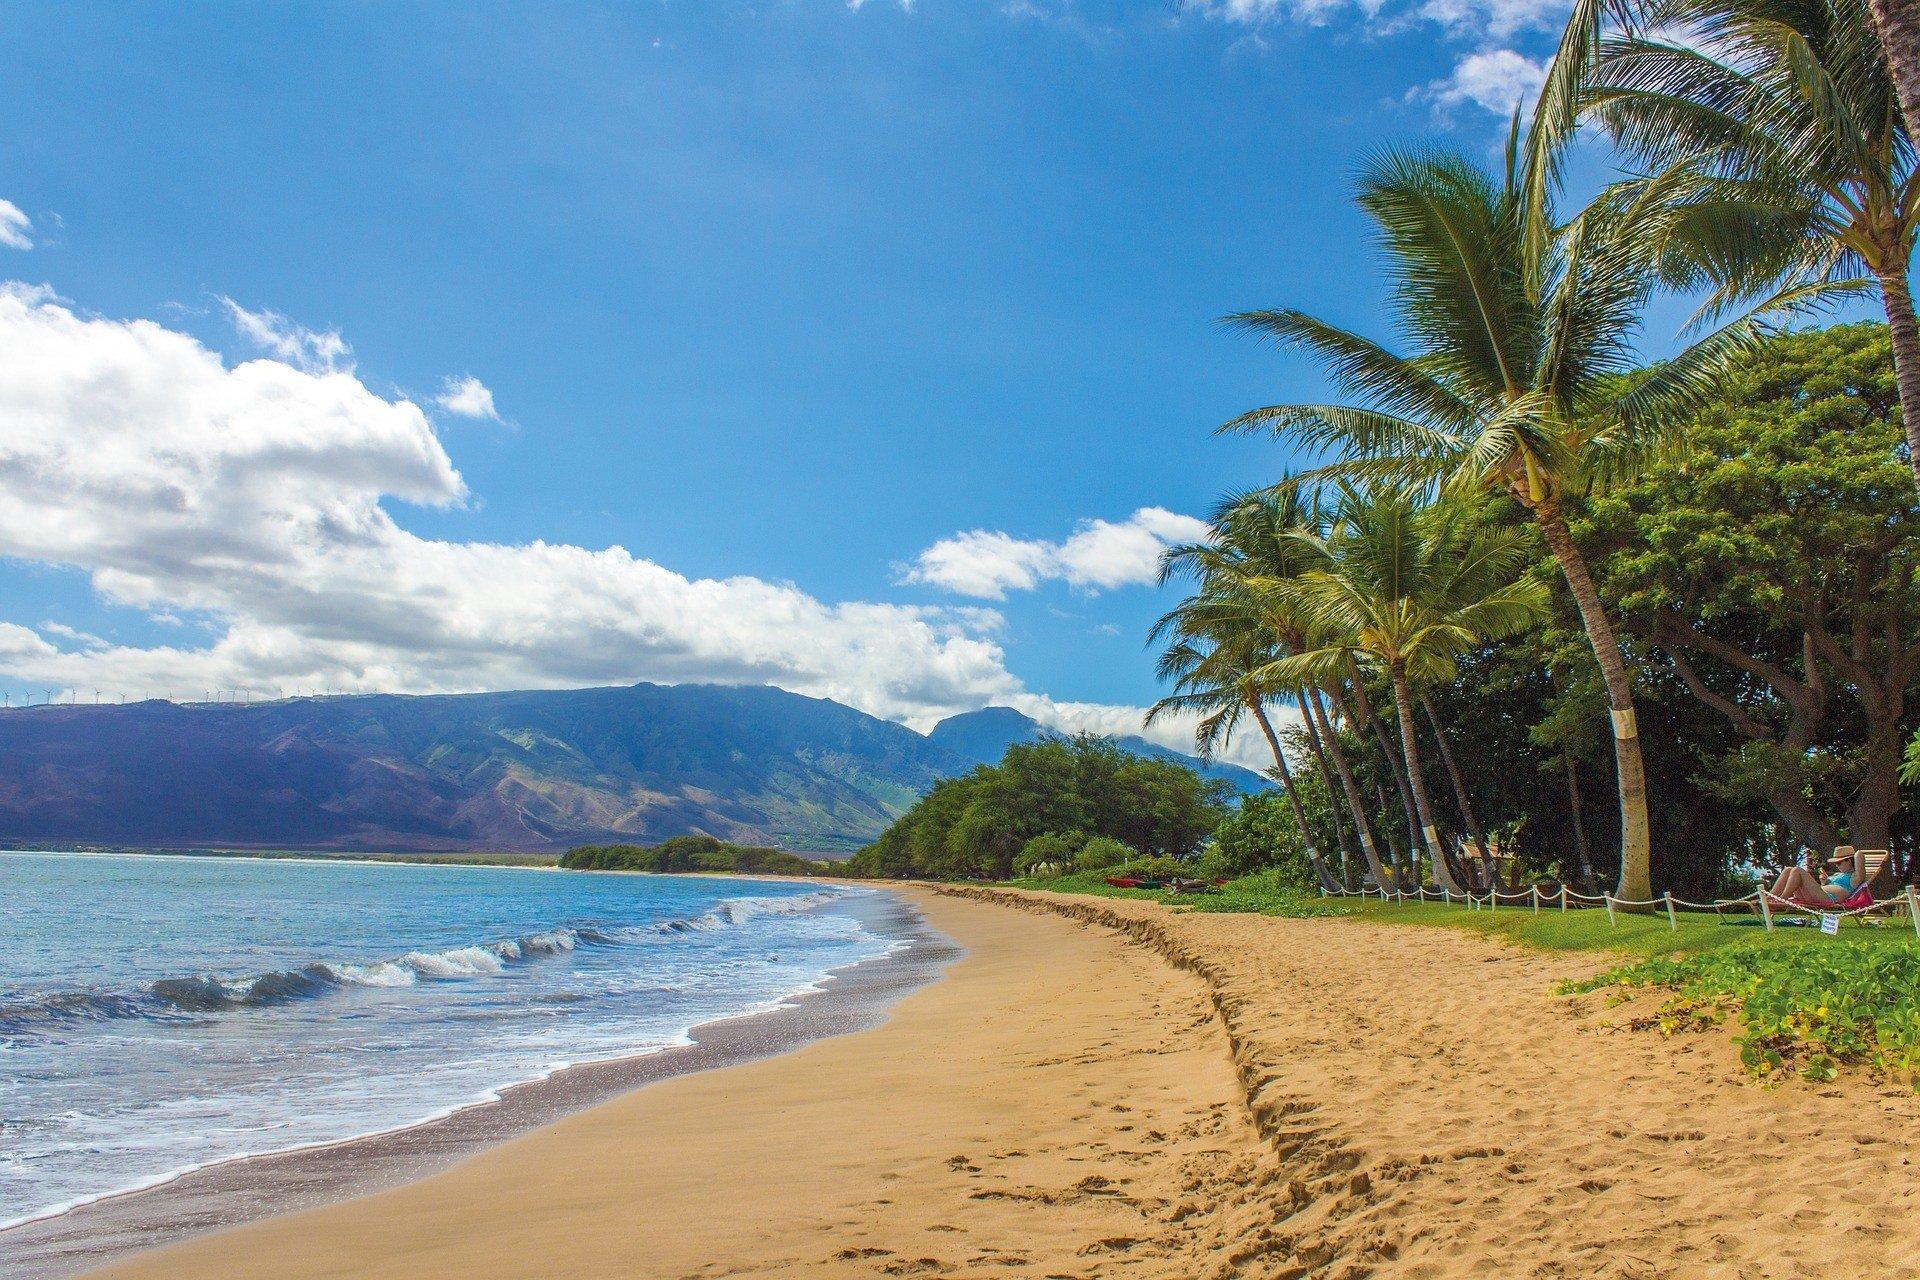 Prestine beach in Maui, Hawaii